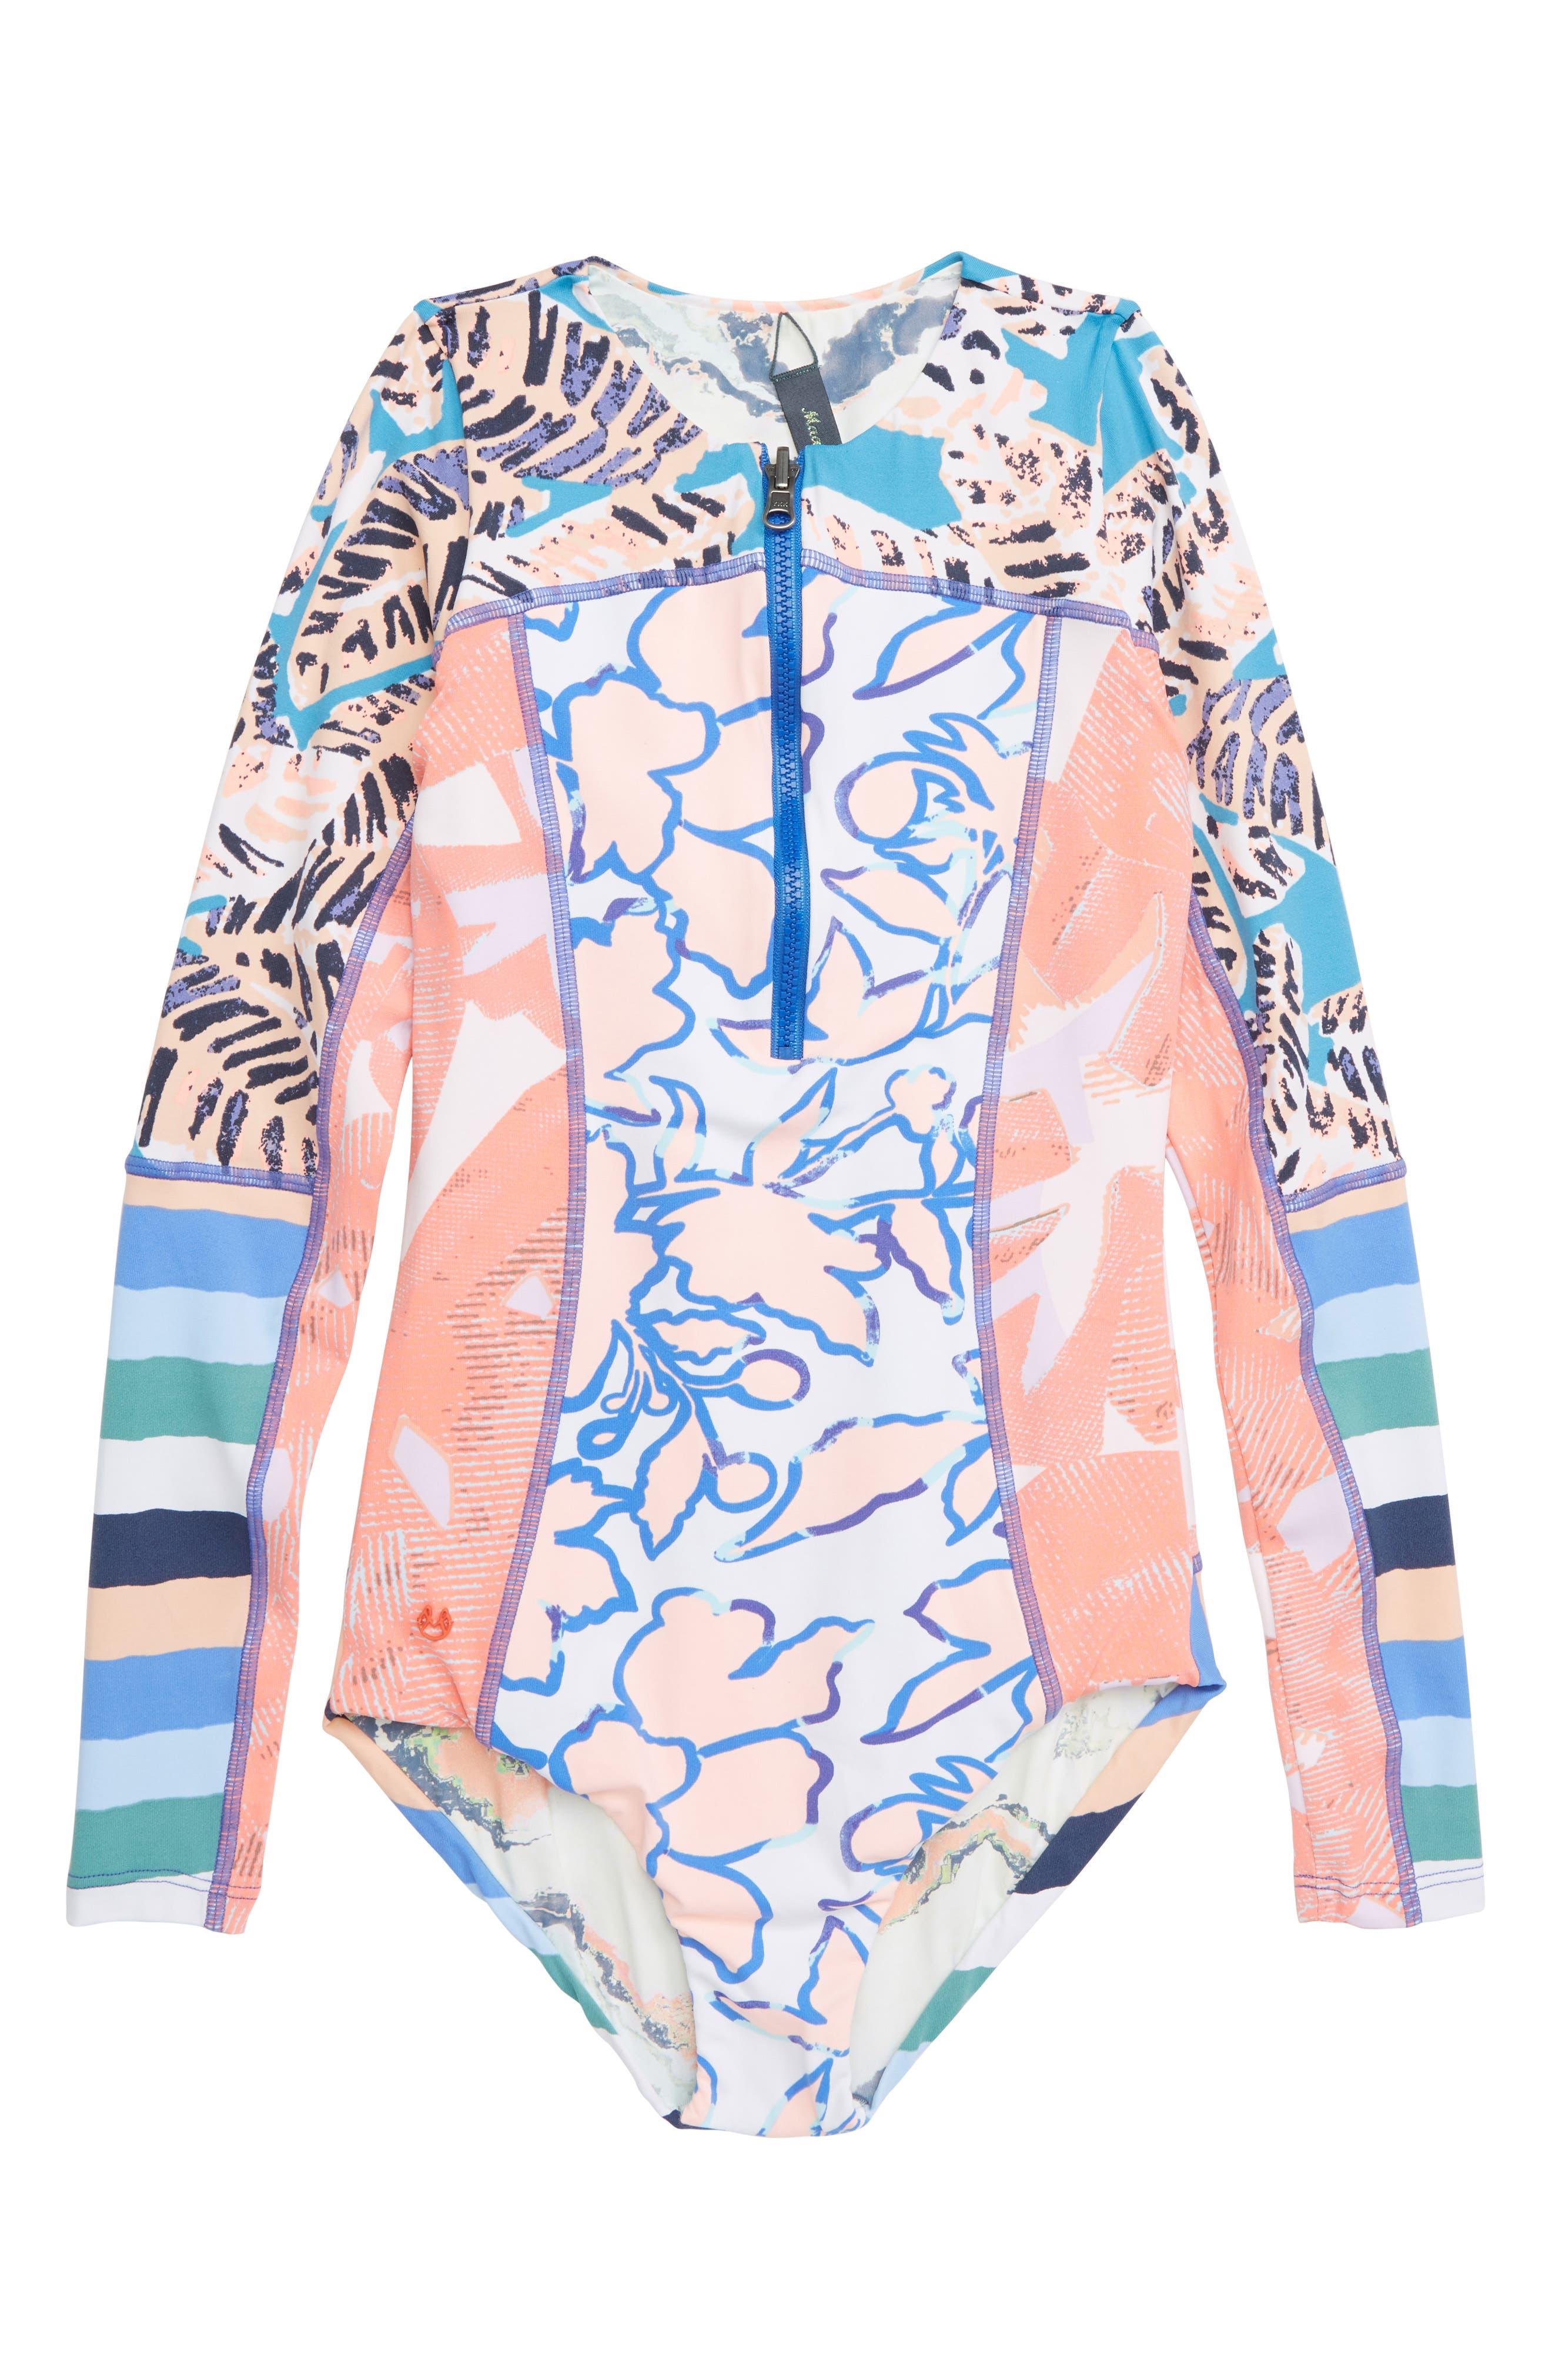 Ocean Joiness Reversible One-Piece Rashguard Swimsuit,                             Main thumbnail 1, color,                             MULTICOLOR